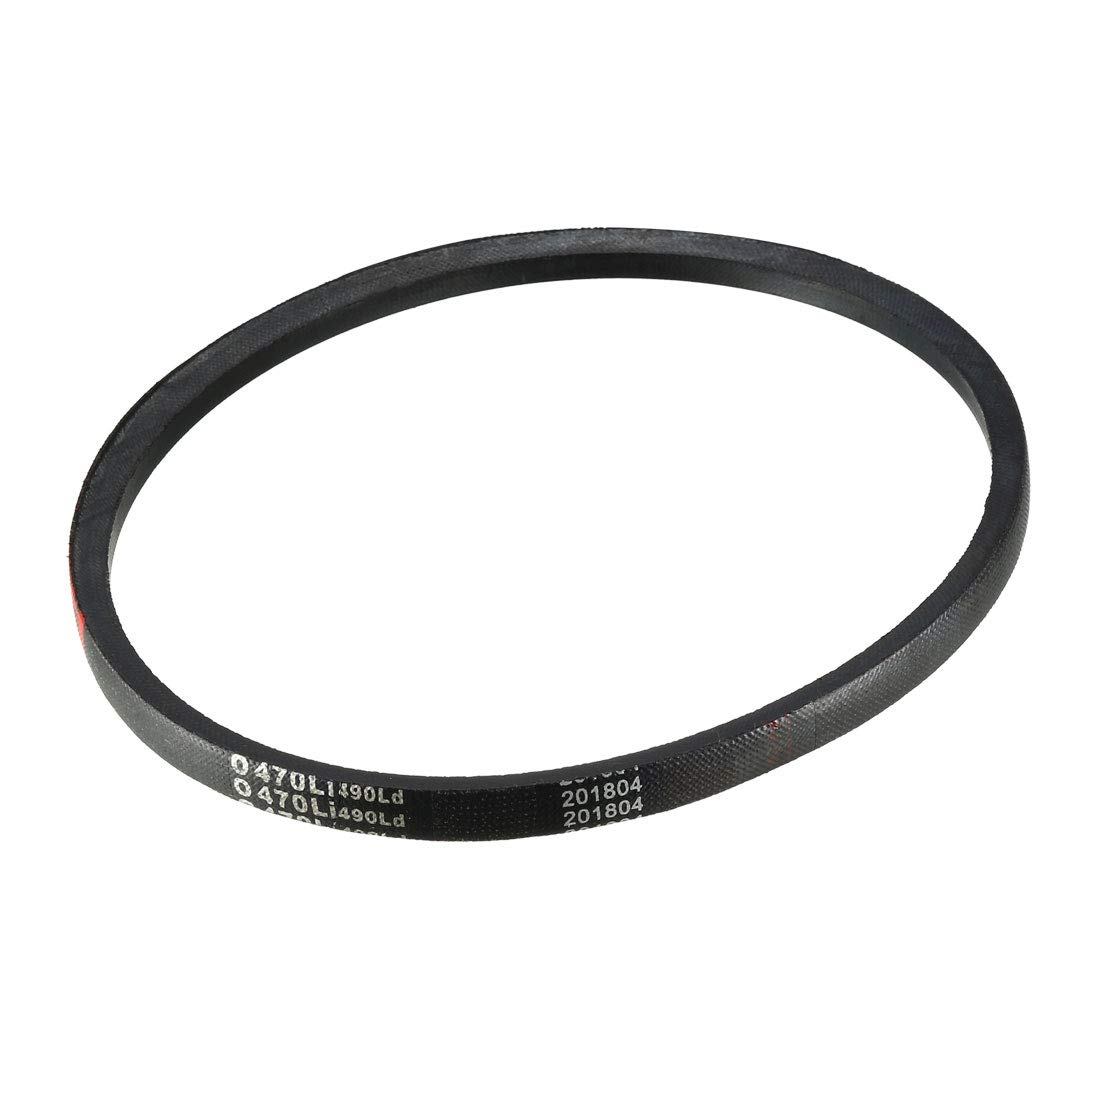 uxcell 0470Li V-Belt Machine Transmission Drive V Belt 20 Inches Rubber Replacement Black